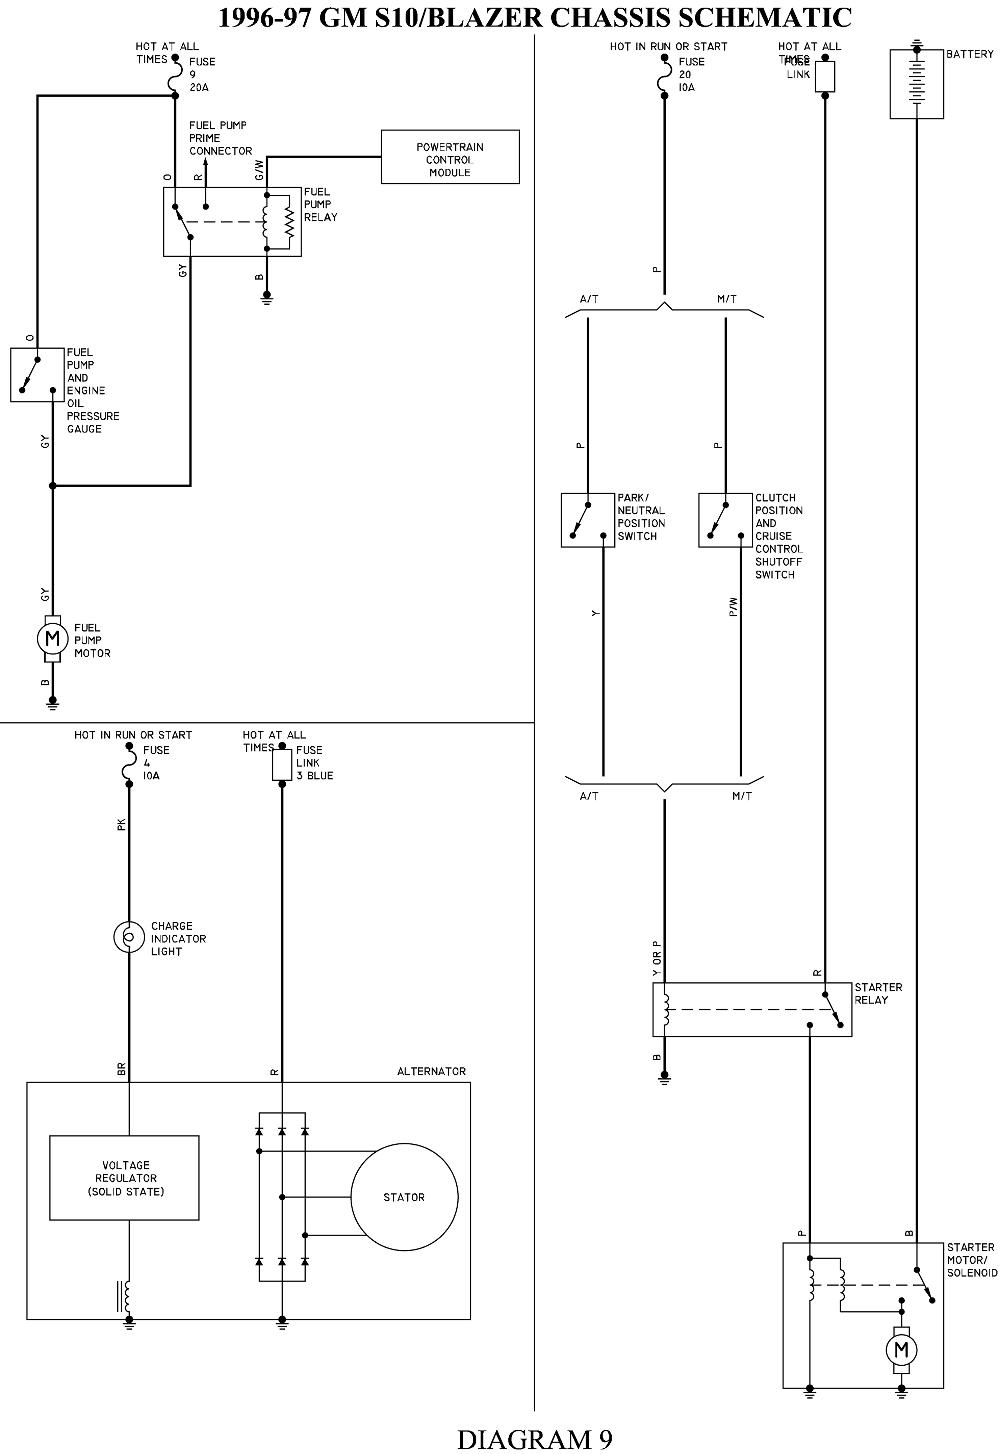 [DIAGRAM_5FD]  1996 S10 Fuel Pump Wiring Diagram Painless Wiring Diagram Turn Signal -  curup.23.allianceconseil59.fr | 98 Chevy Fuel Pump Wiring Diagram |  | curup.23.allianceconseil59.fr